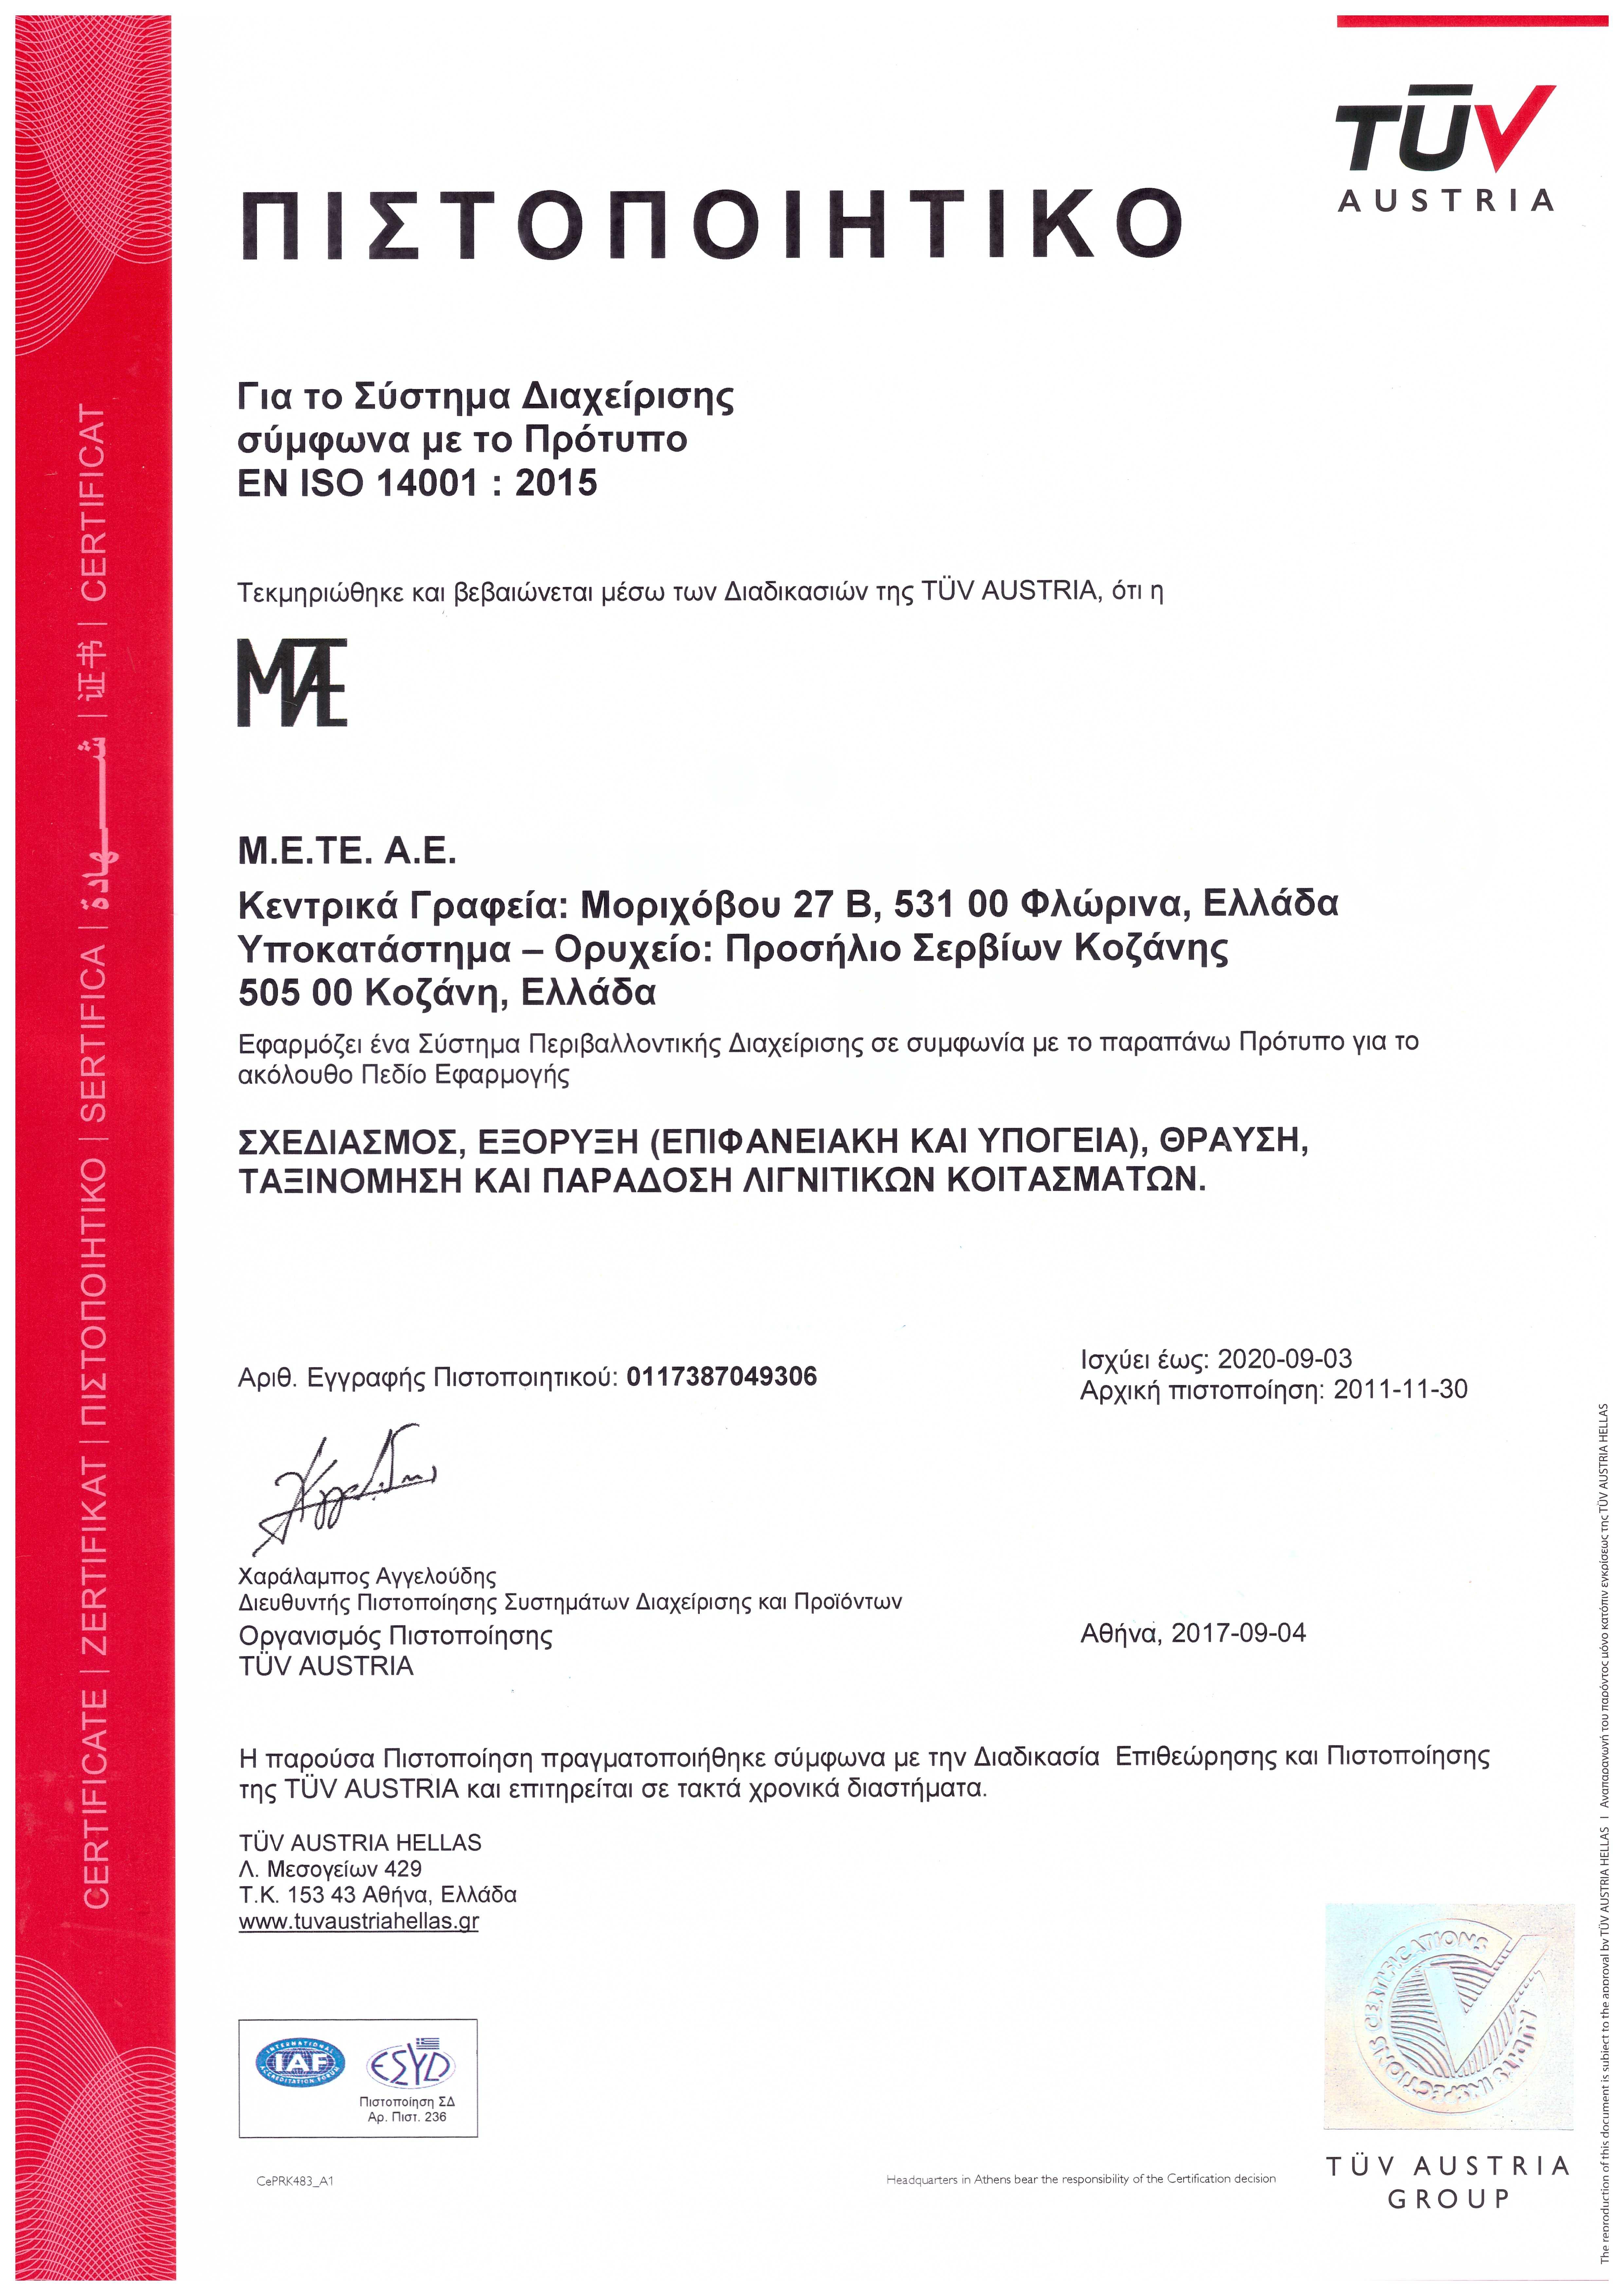 20171005-ISO 14001 ΕΛΛΗΝΙΚΑ